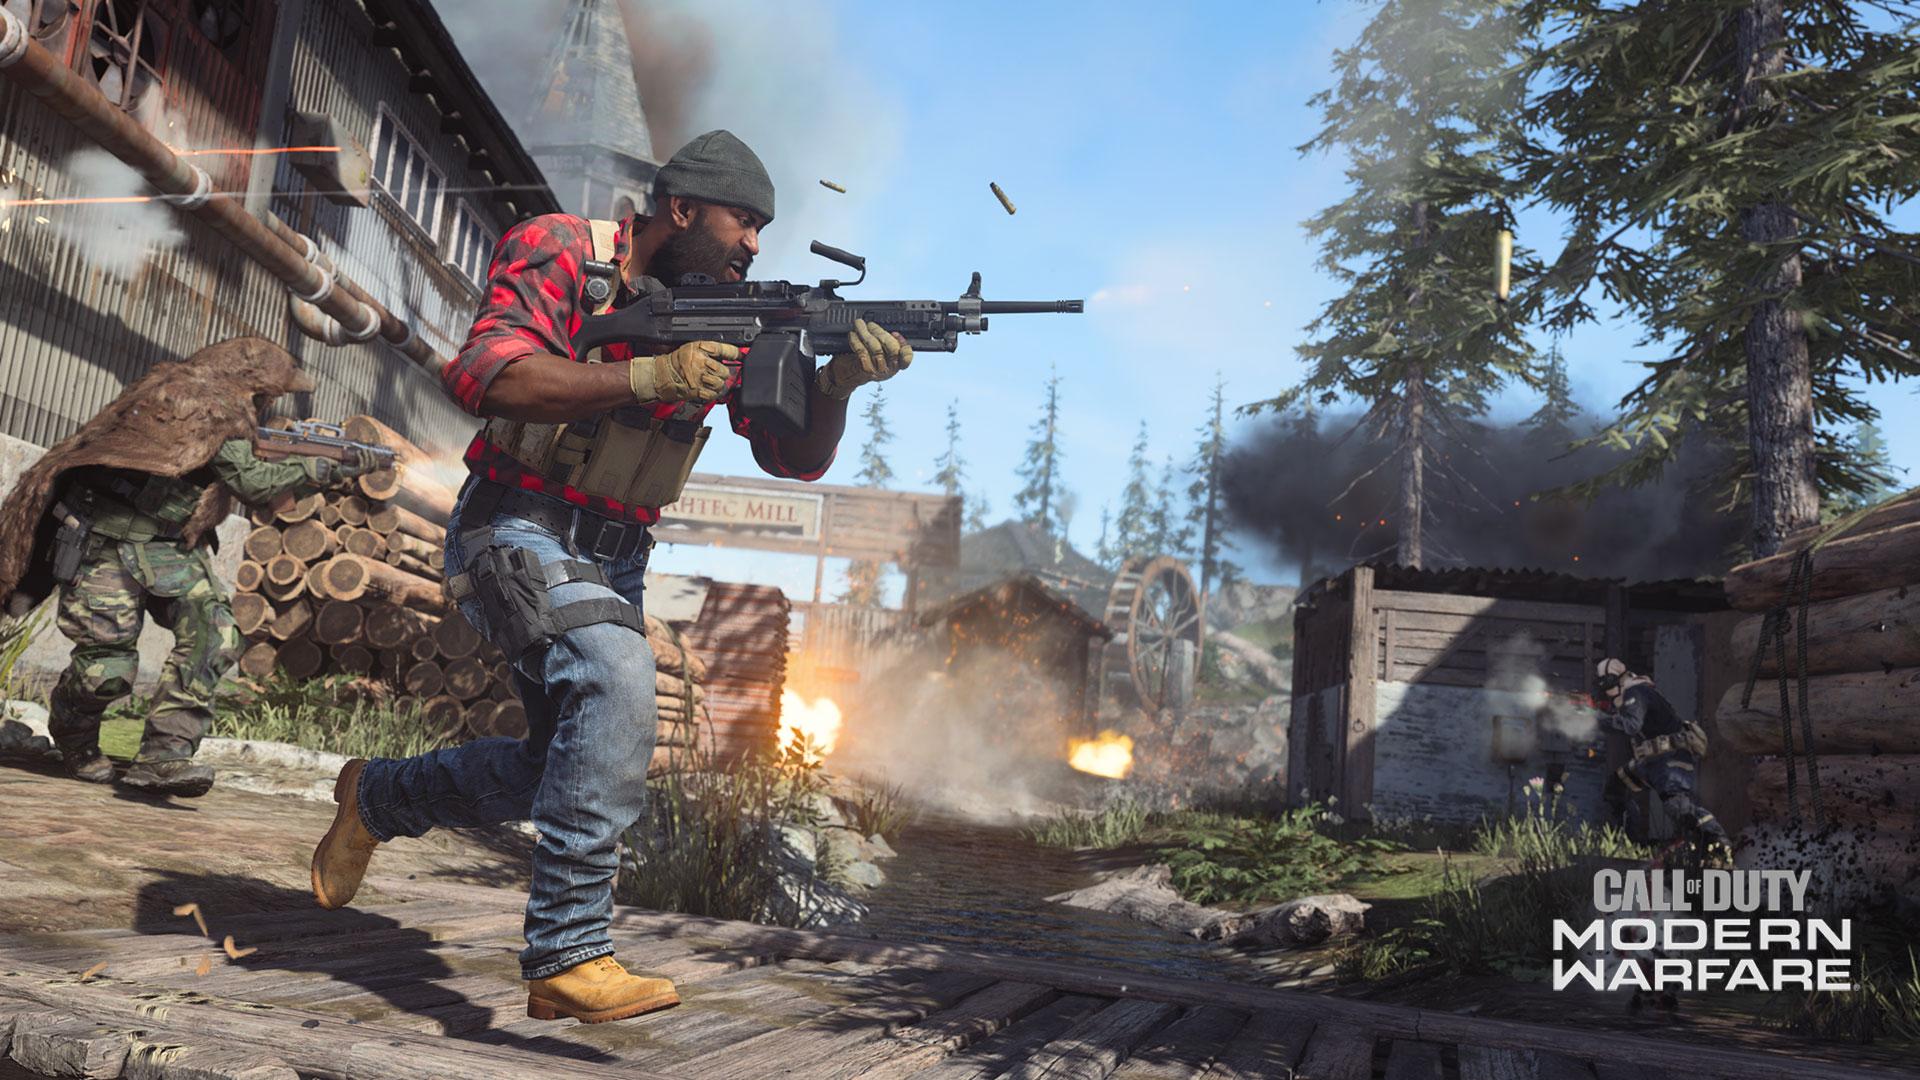 The Bruen MK9: How to Unlock the New LMG in Call of Duty®: Modern Warfare® - Image 4